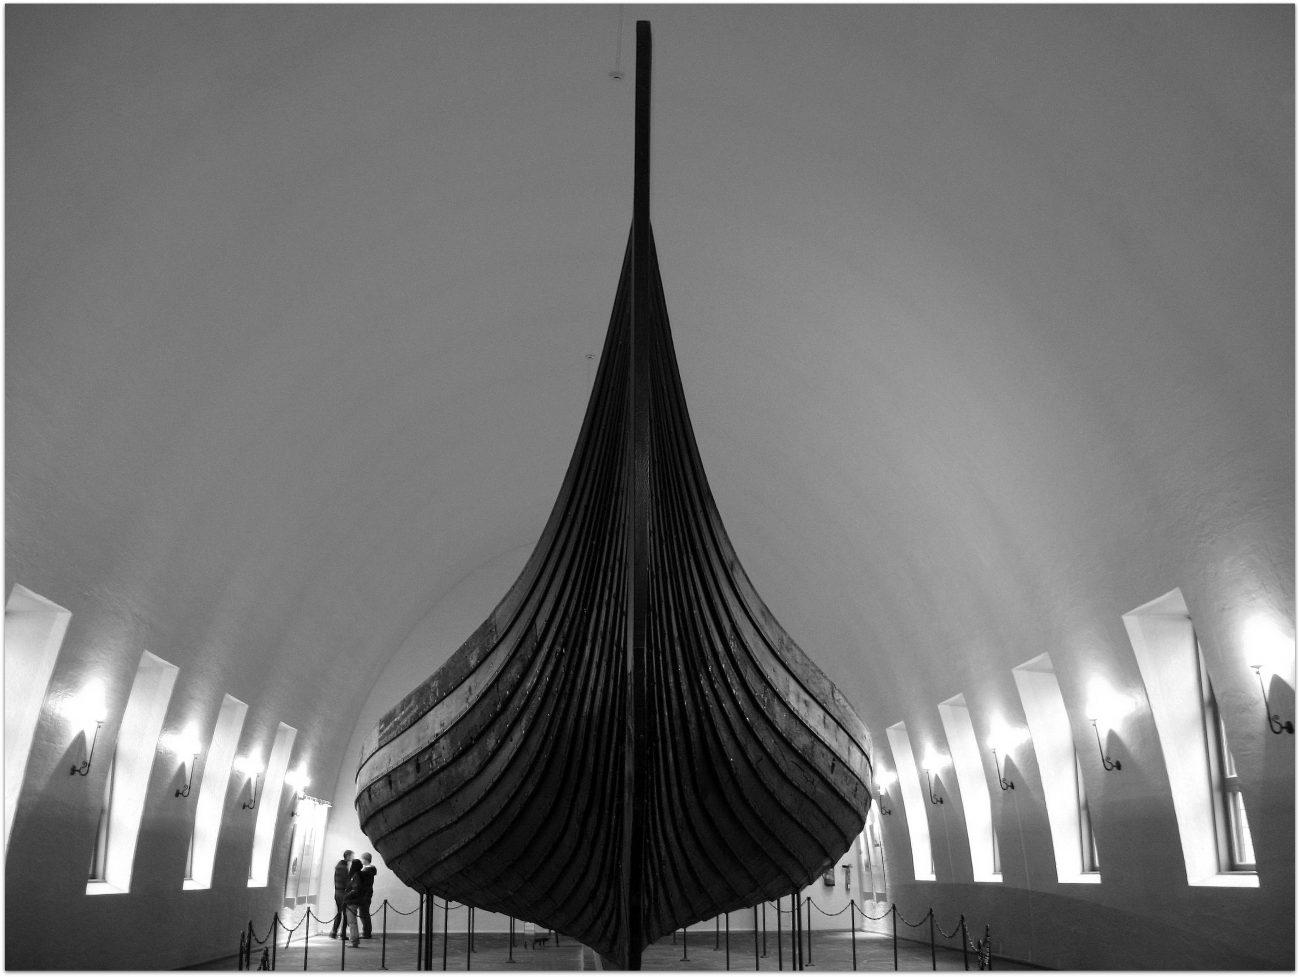 Barco-vikingo1-e1470847297384